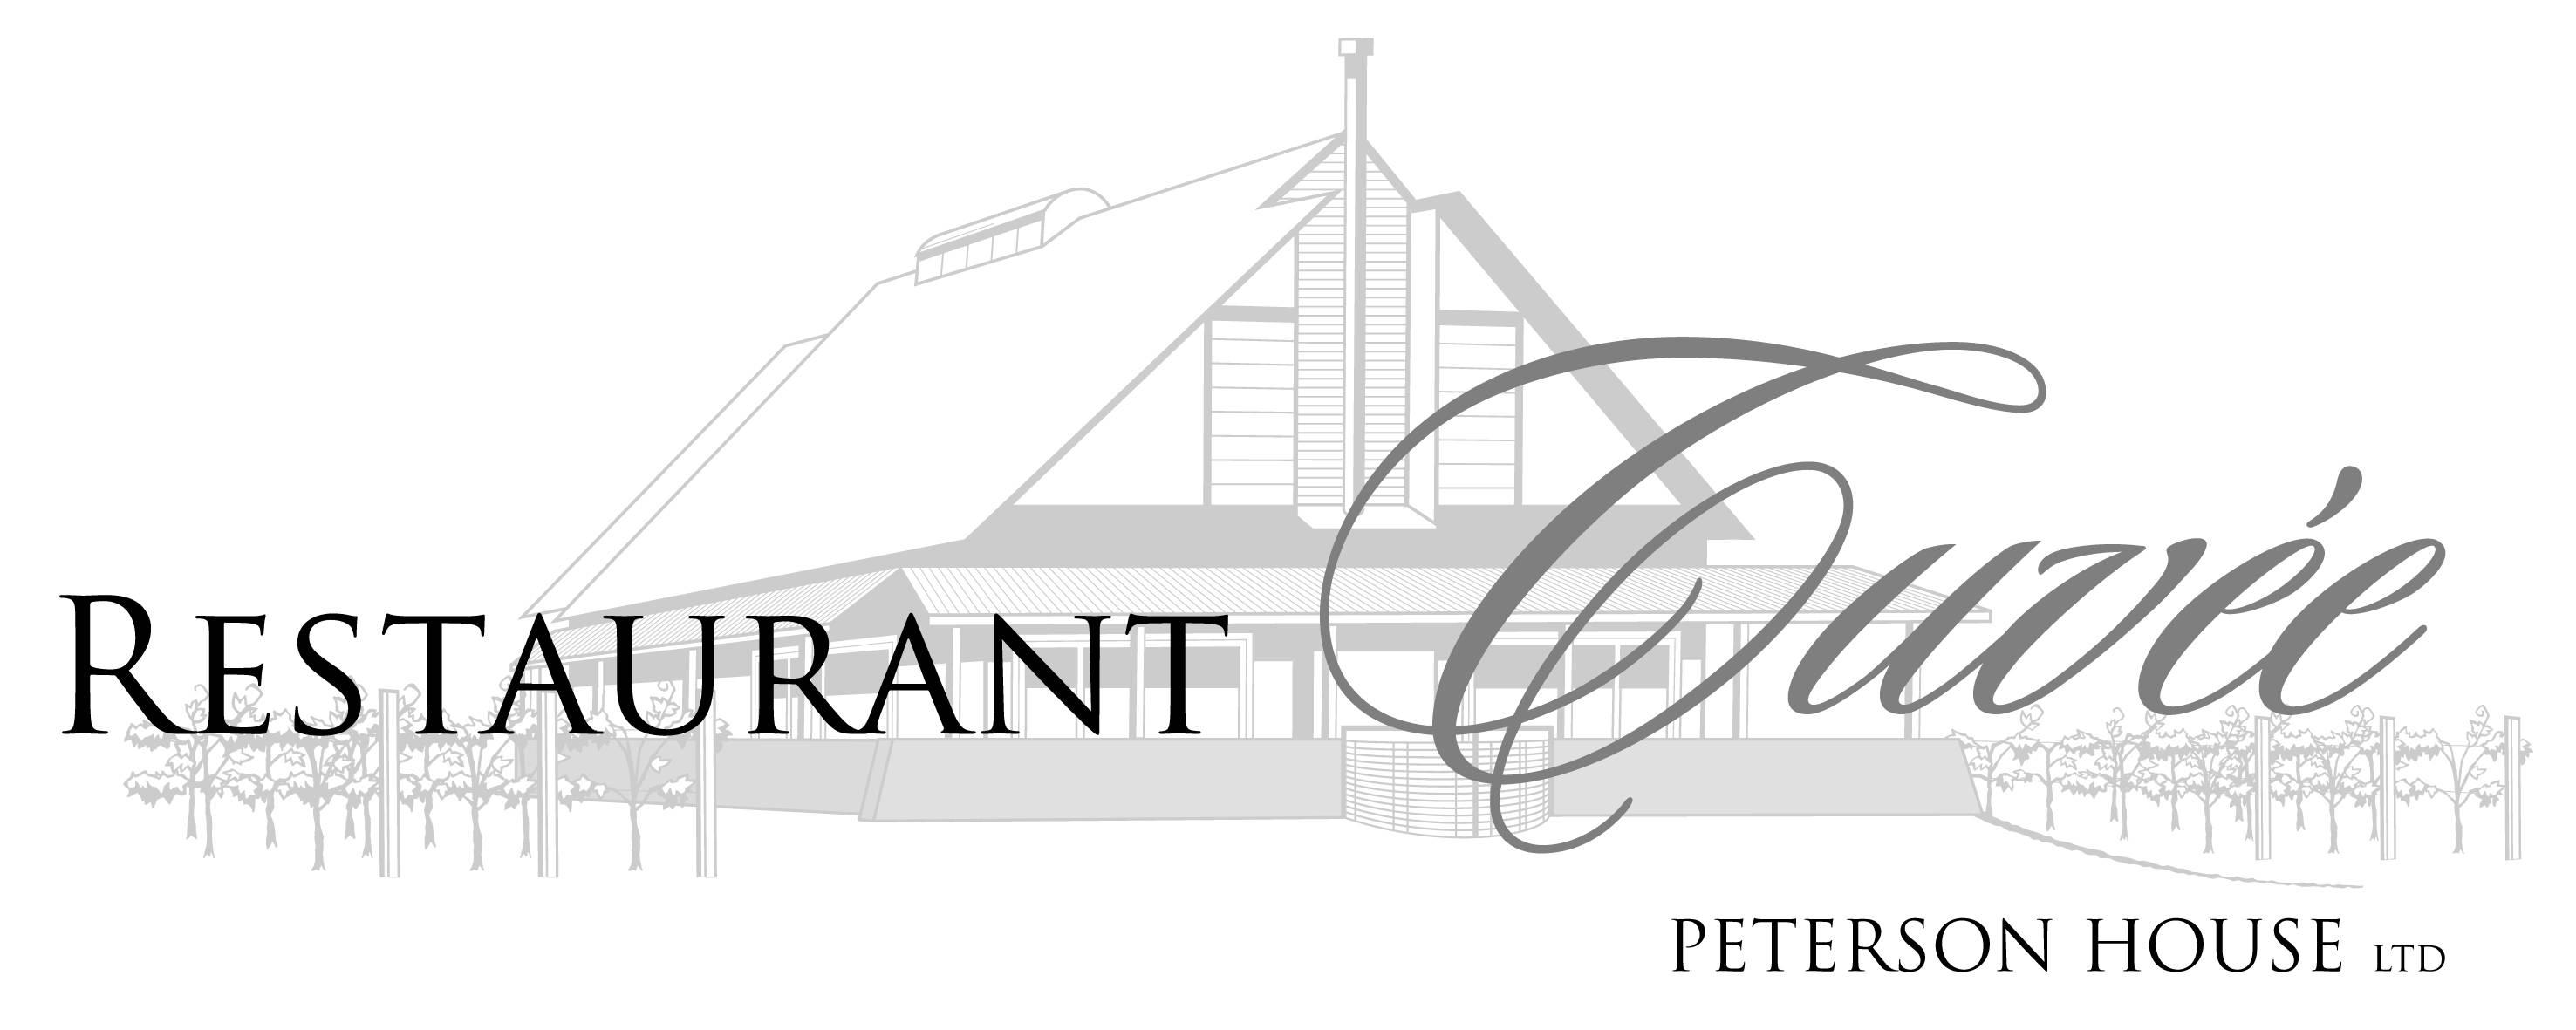 Restaurant Cuvee Logo